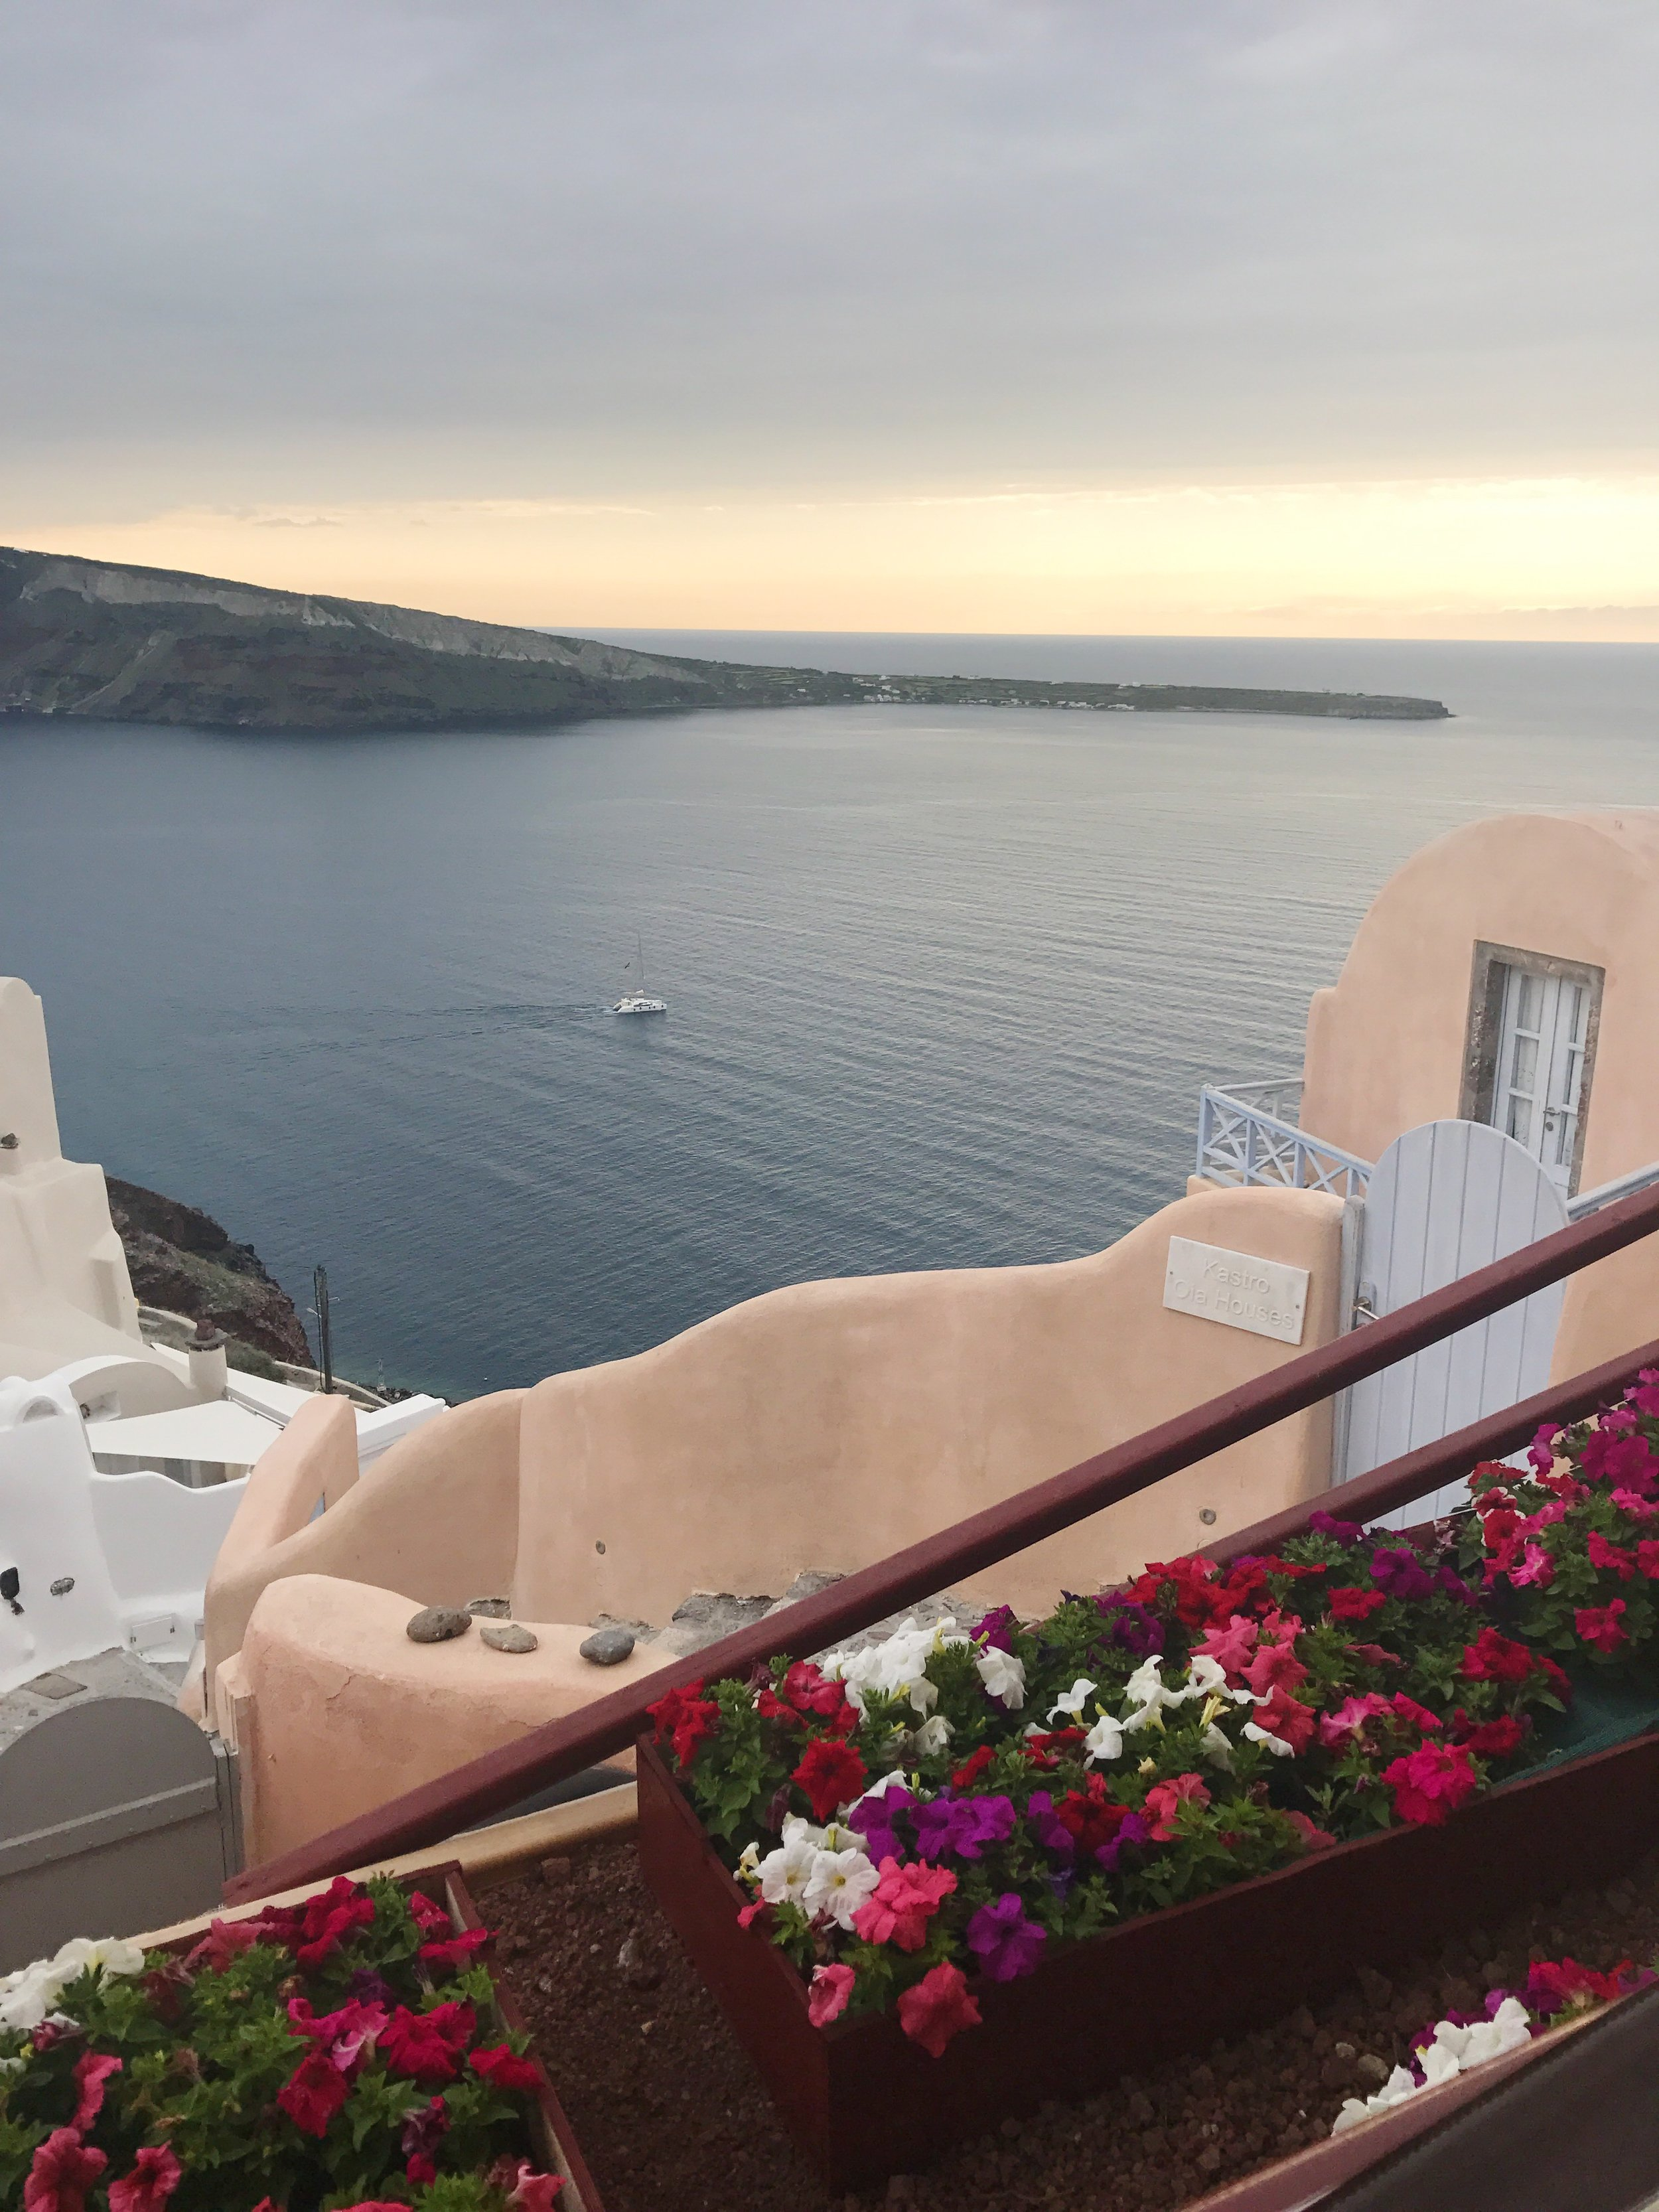 another unforgettable Santorini sunset